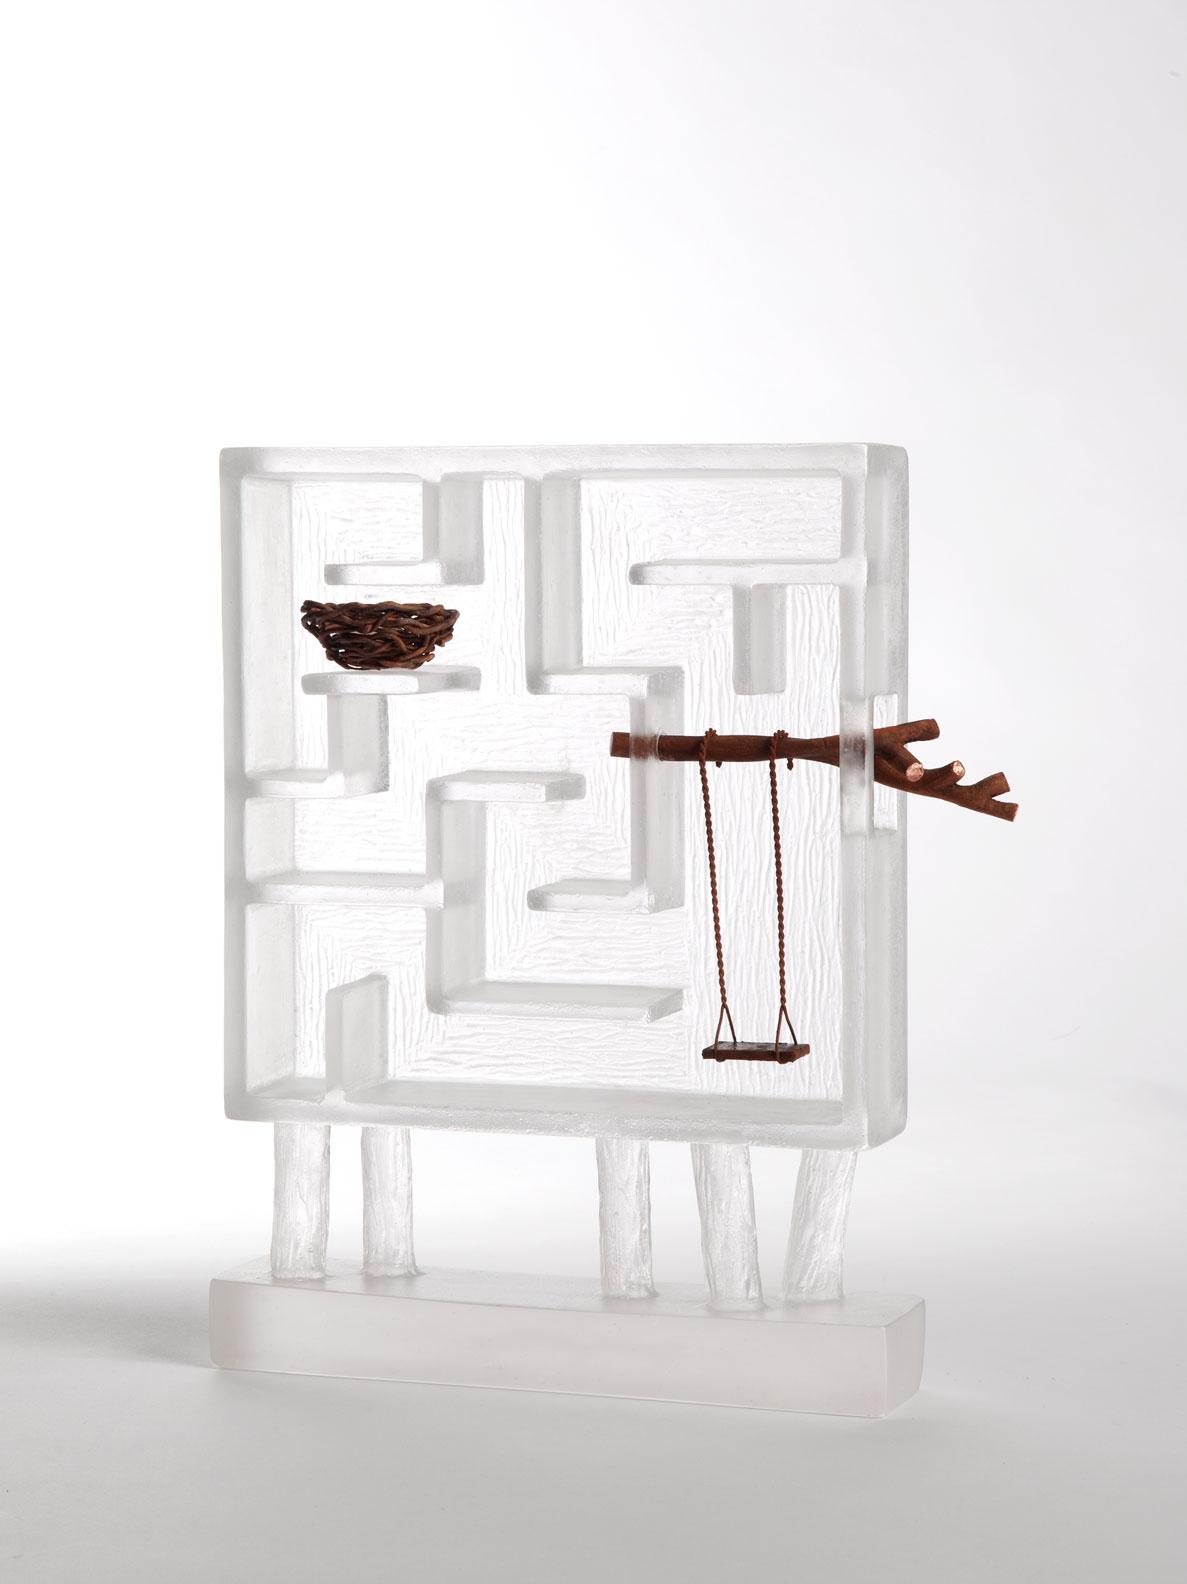 Carole Frève, Glass Sculptor